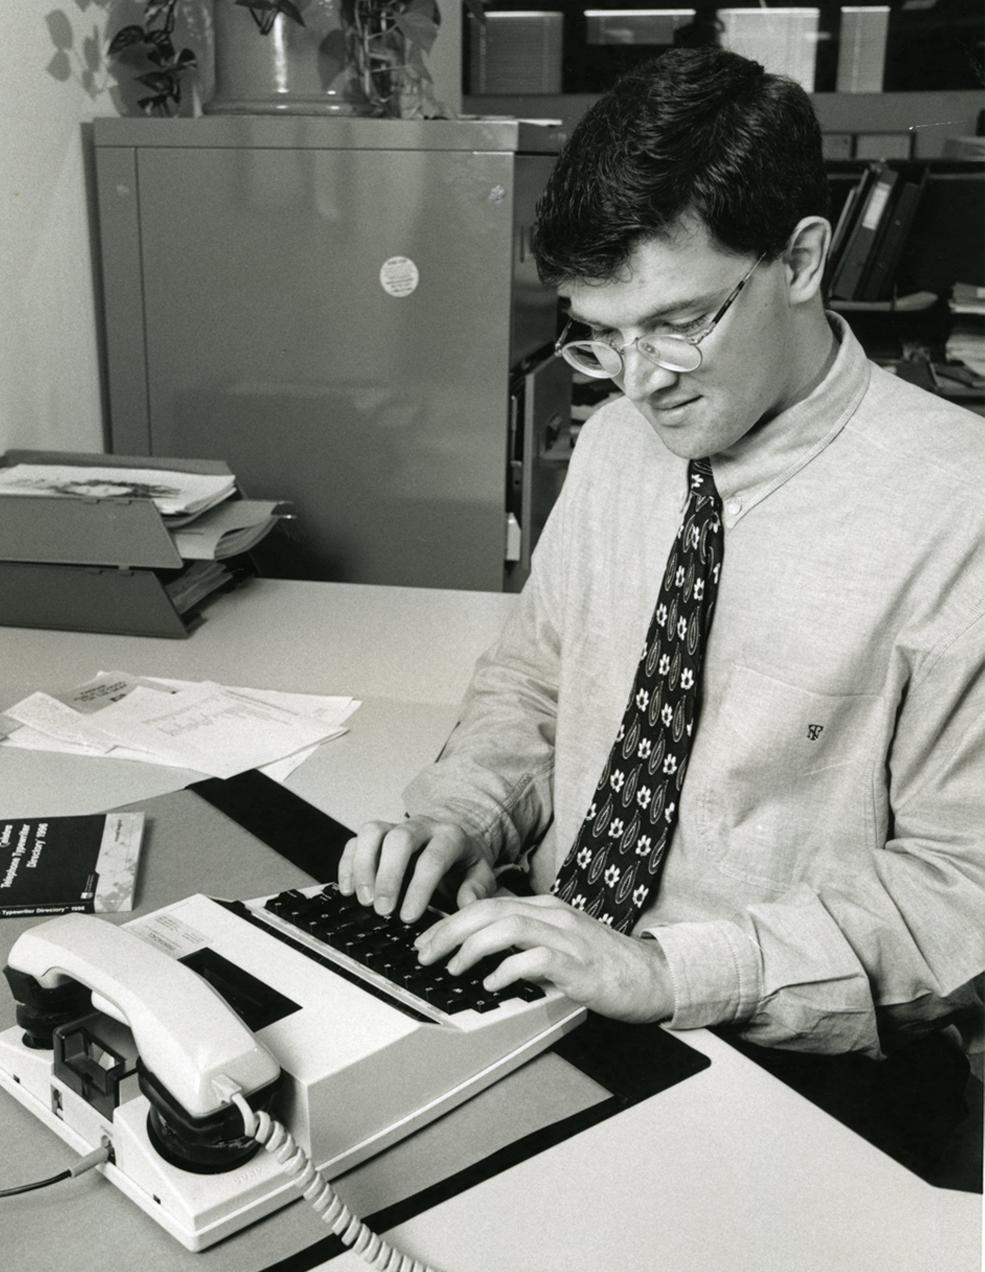 Stephen Nicholson using a TTY, 1990s